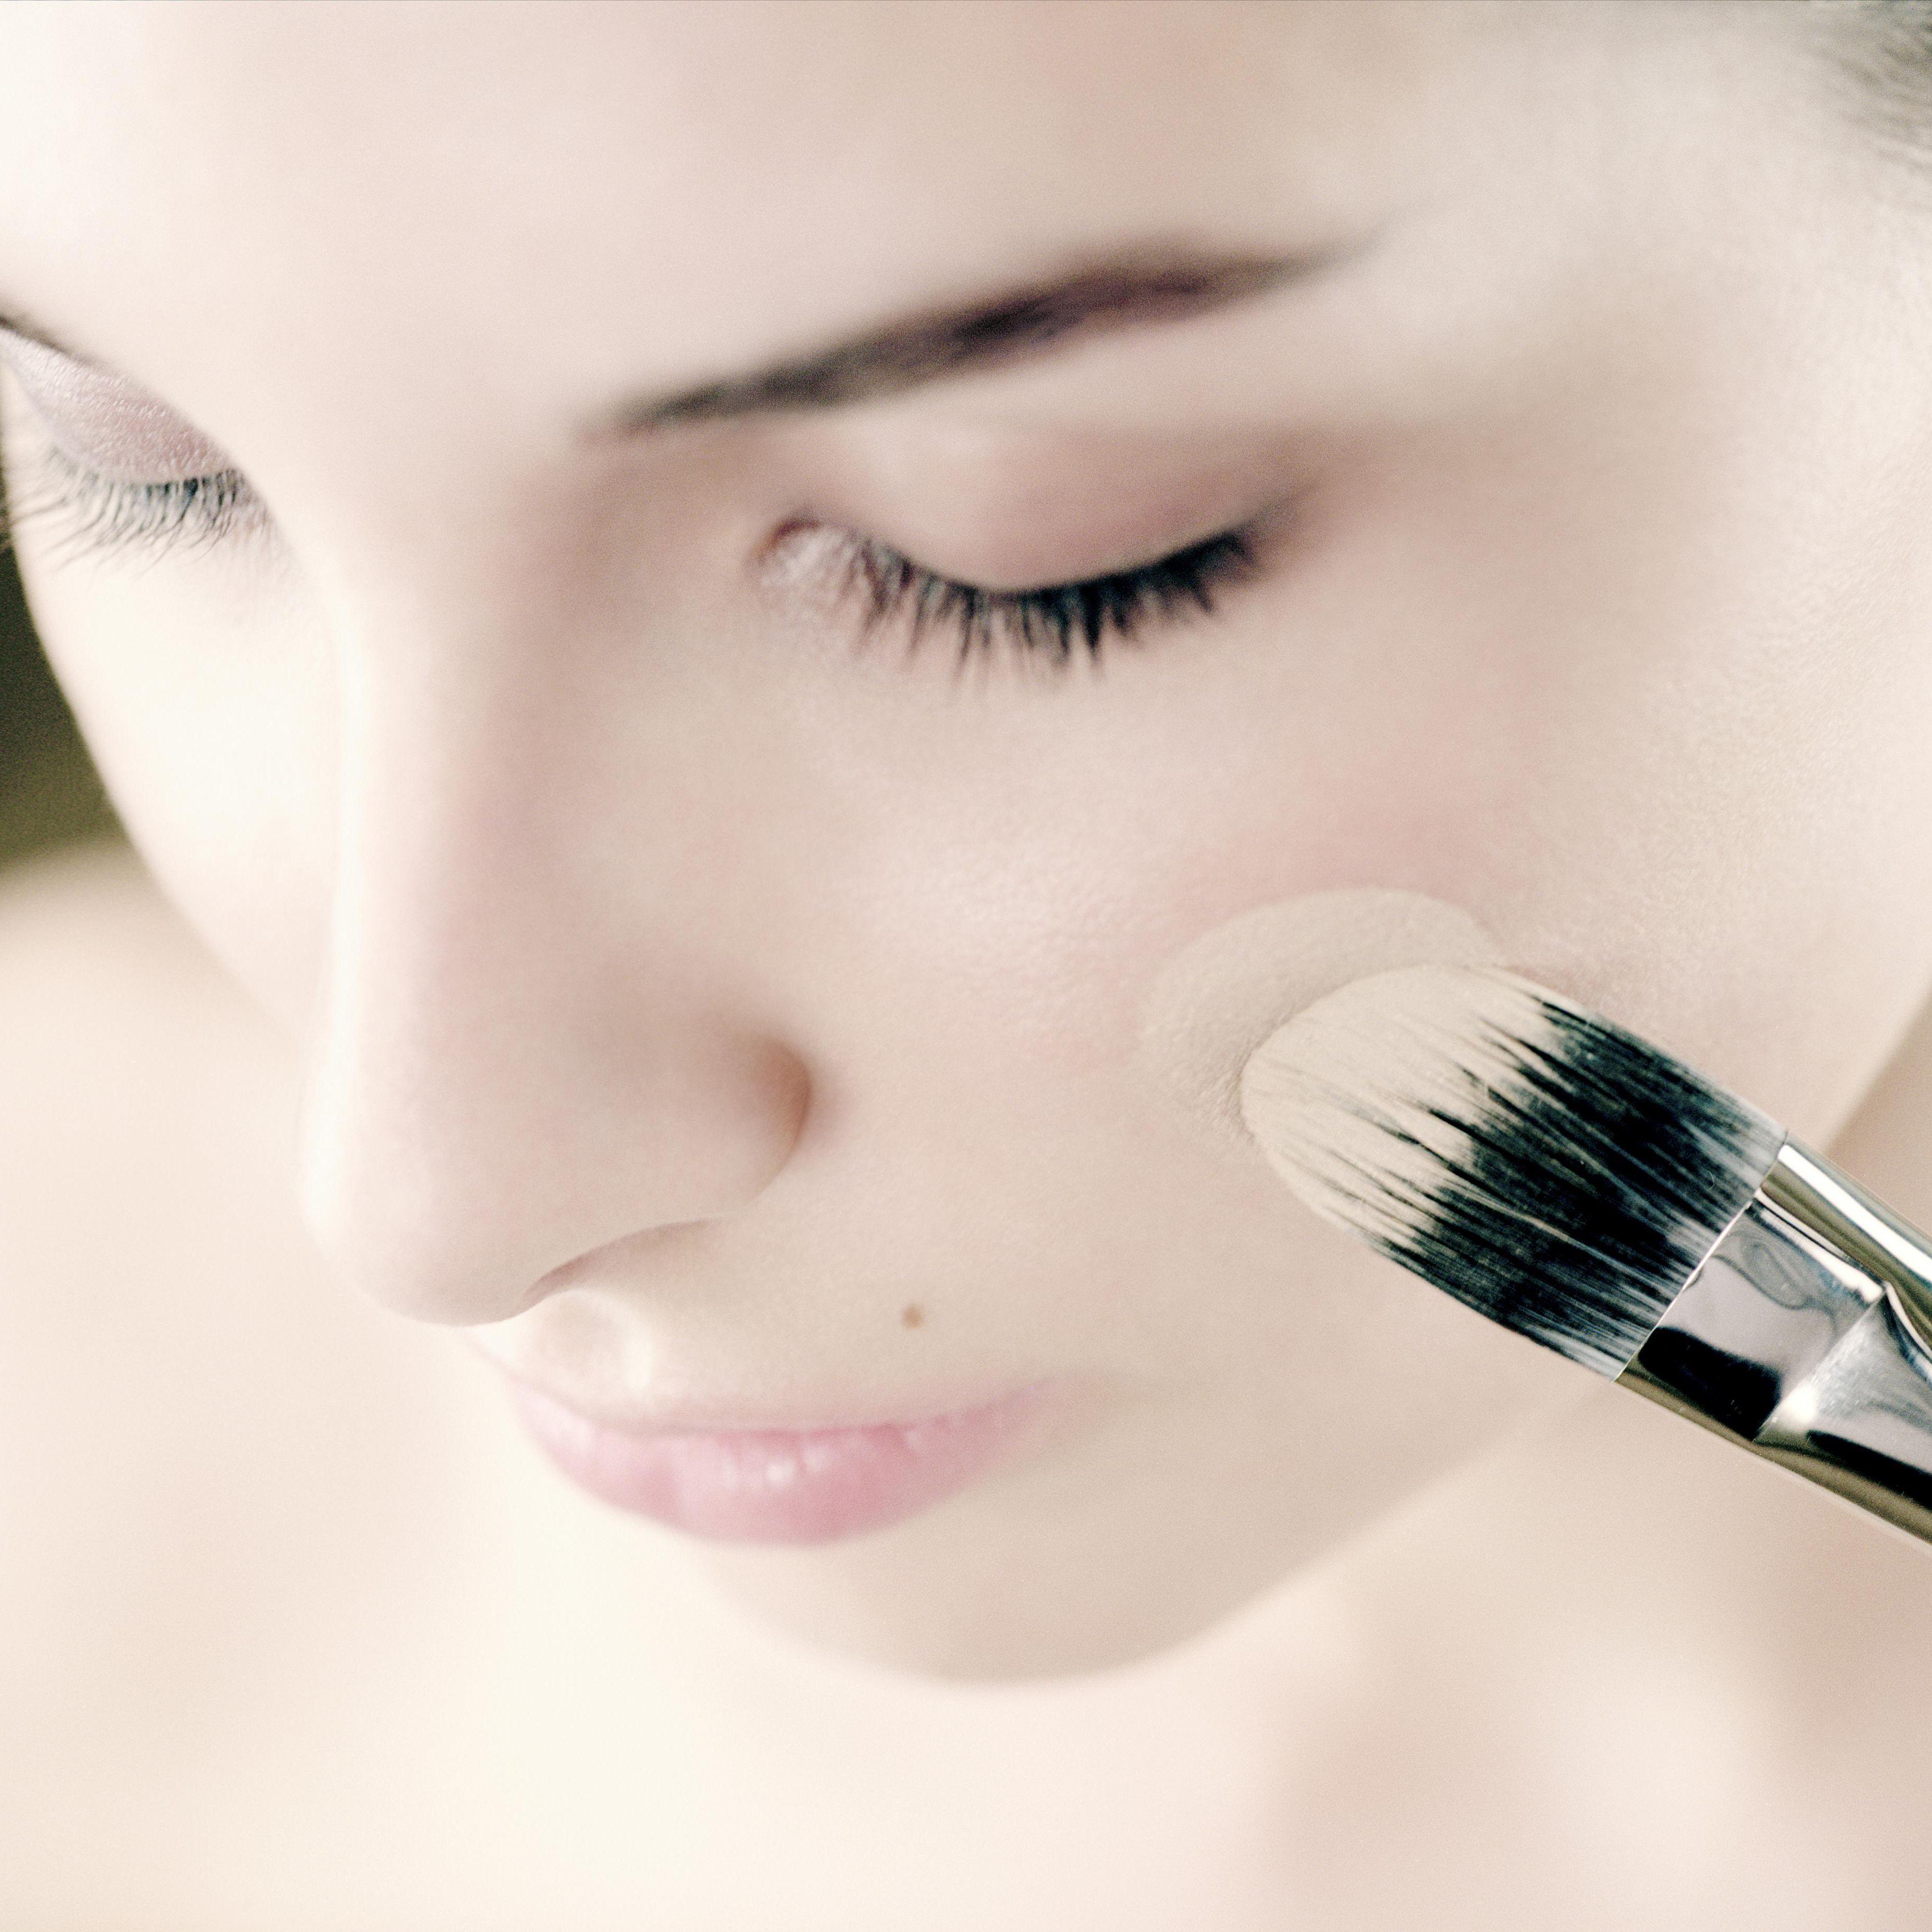 Liquid Powder And More Makeup